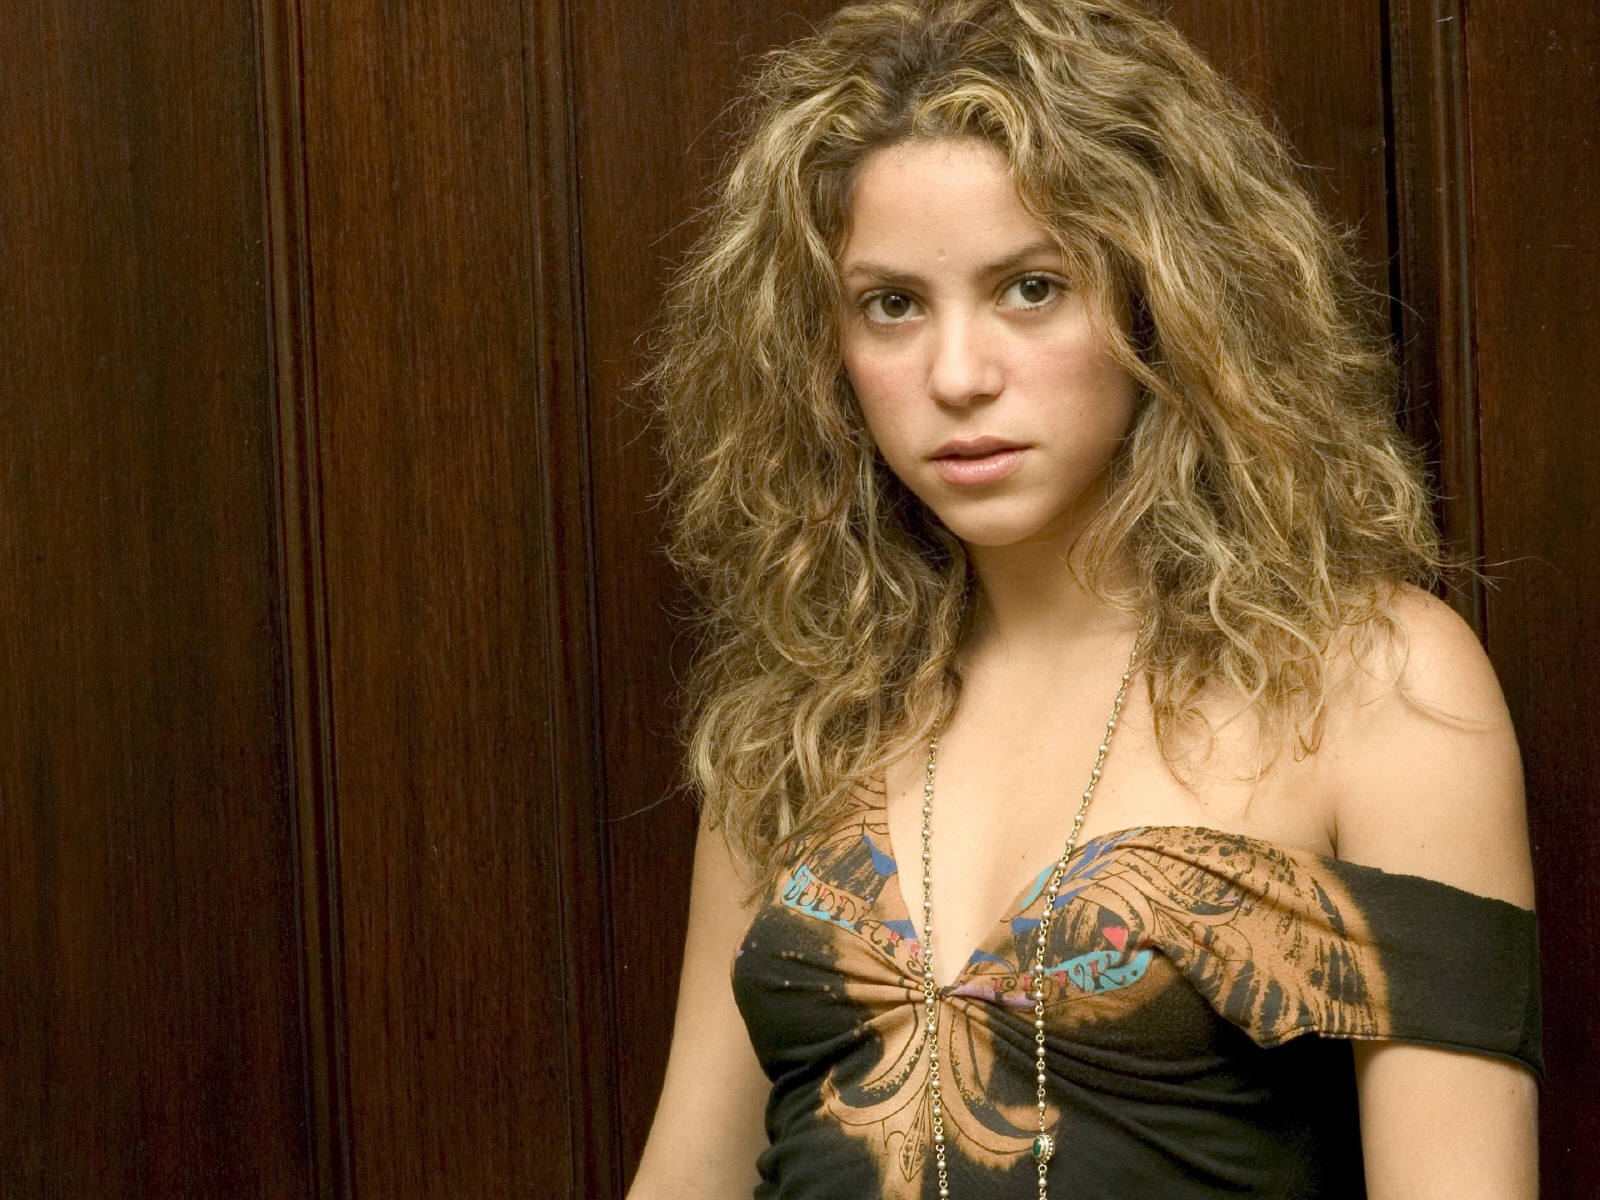 http://2.bp.blogspot.com/-DxERwO8u2pM/TtTj3rFBSeI/AAAAAAAAA4o/Hz6KXiIcCwM/s1600/Shakira_pop_singer_glamorous_wallpaper.jpg